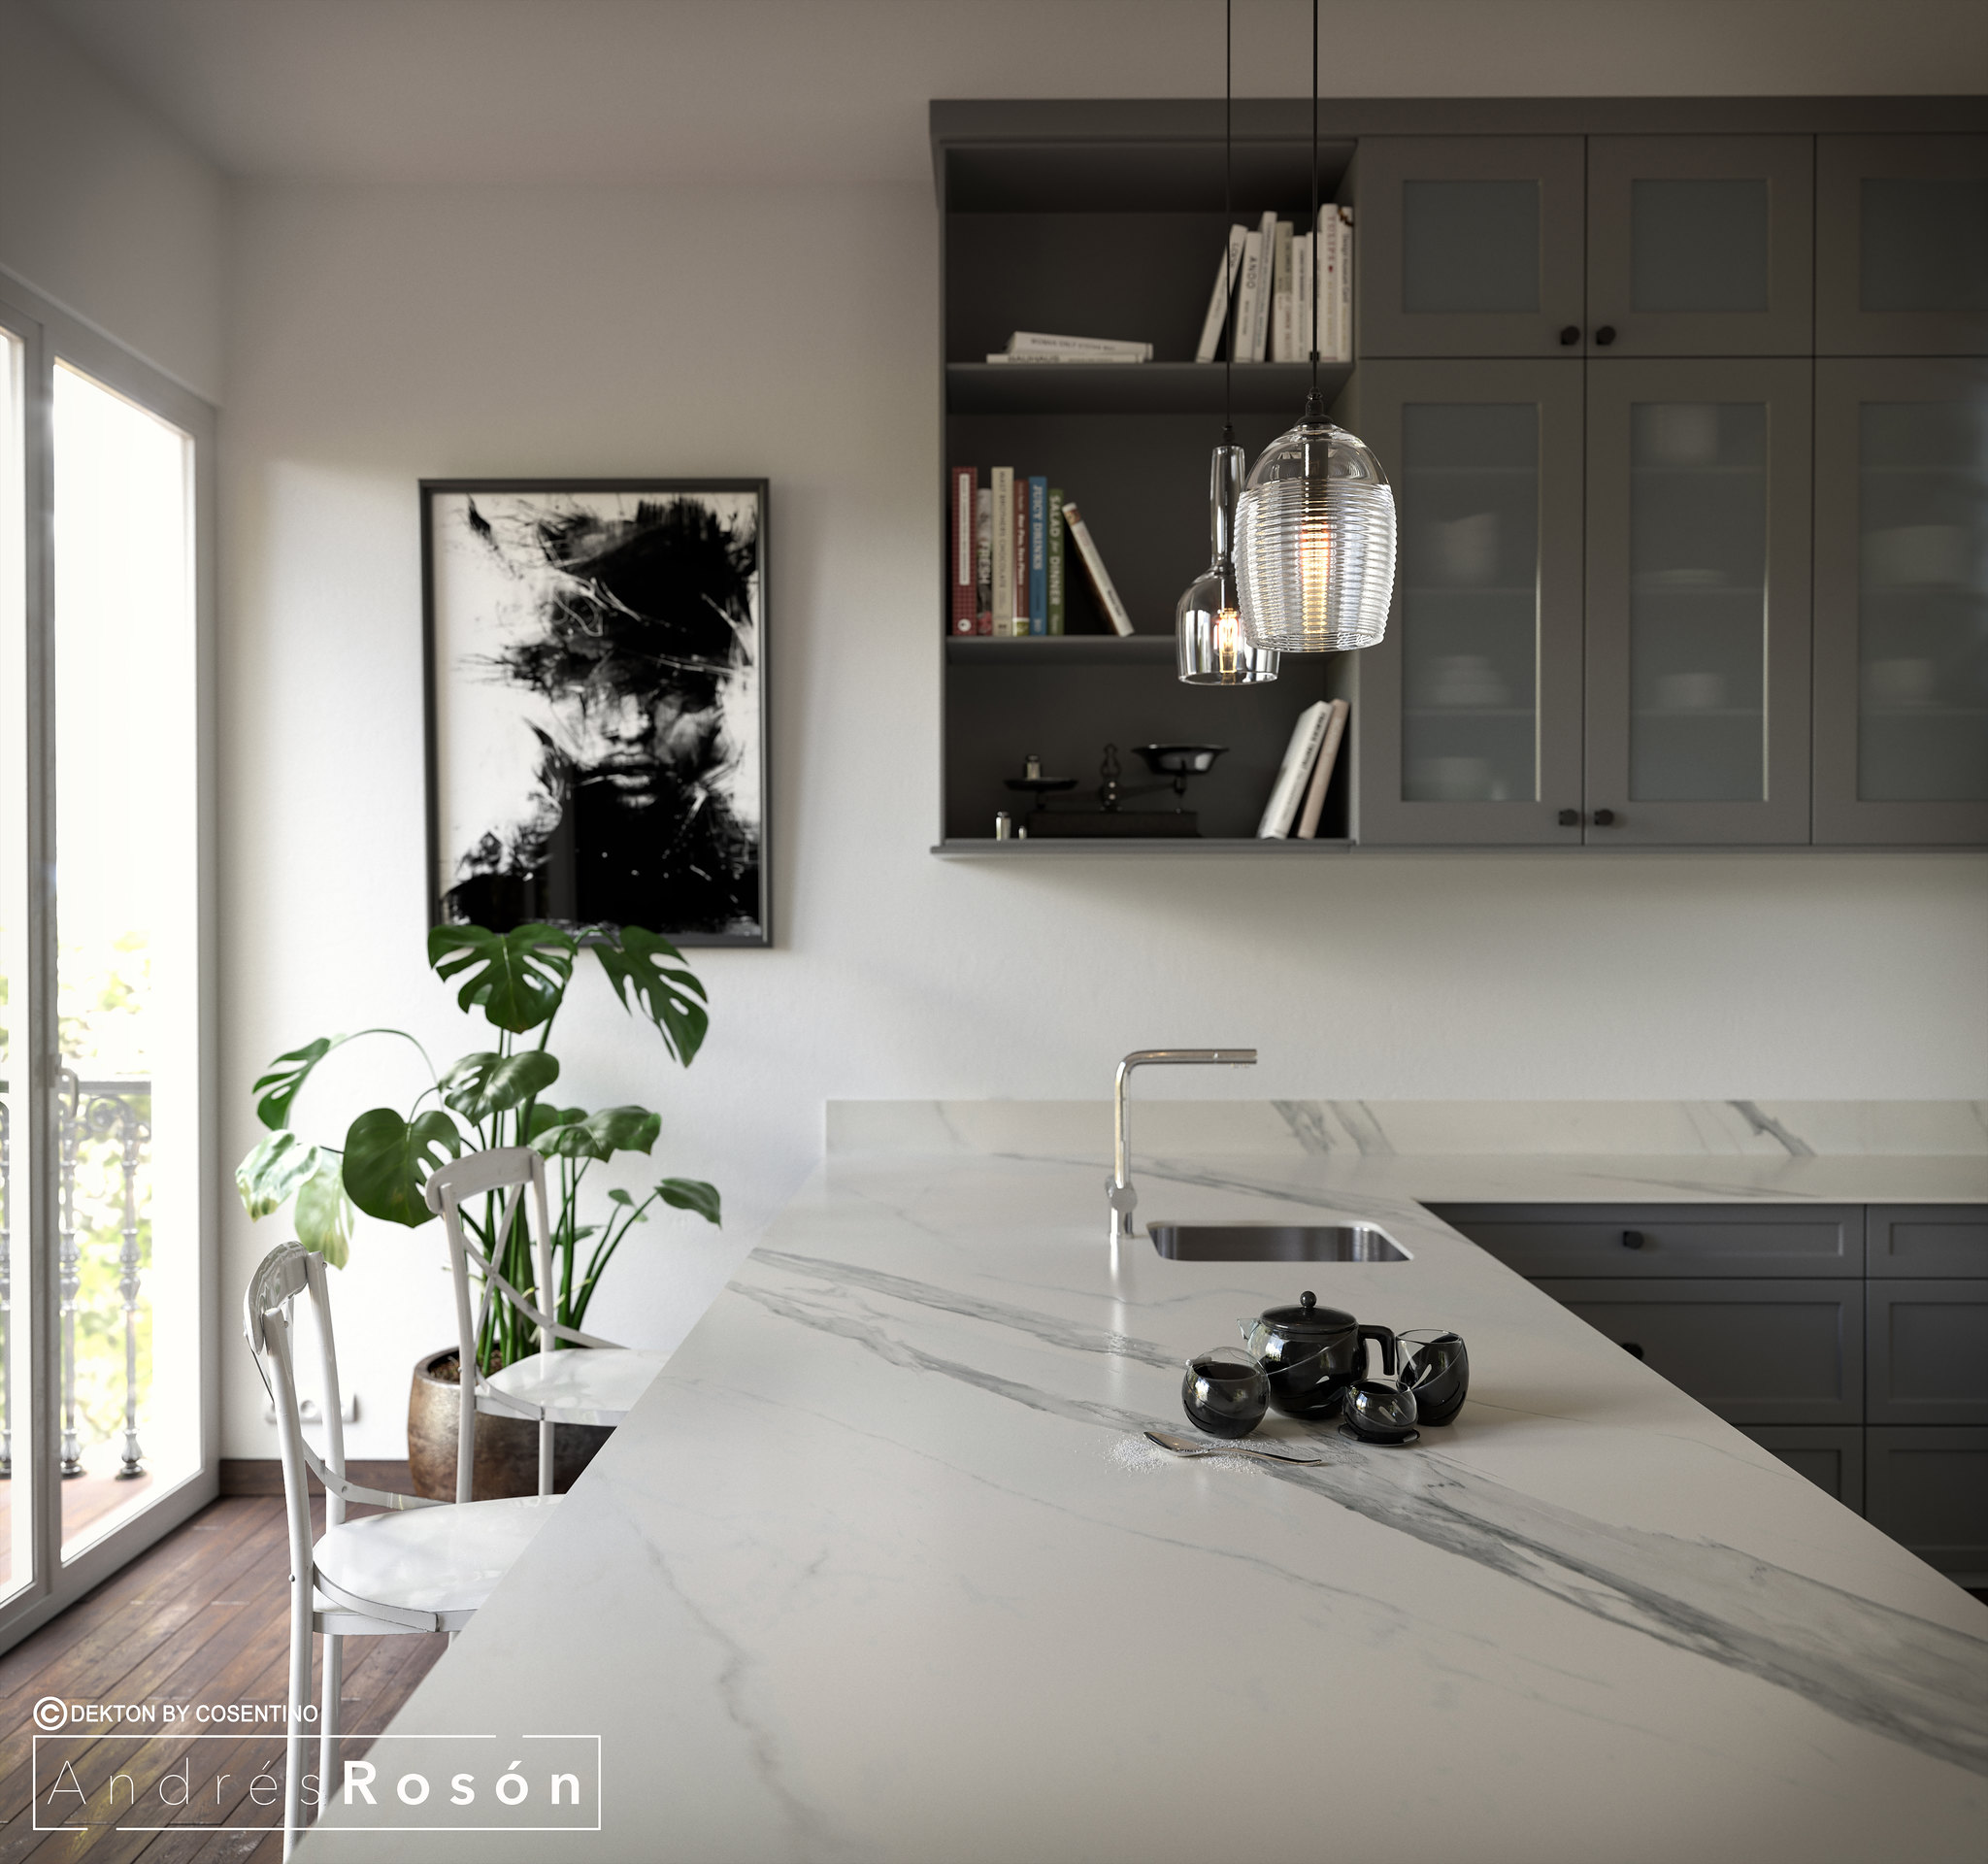 Kitchen Spaces nº1